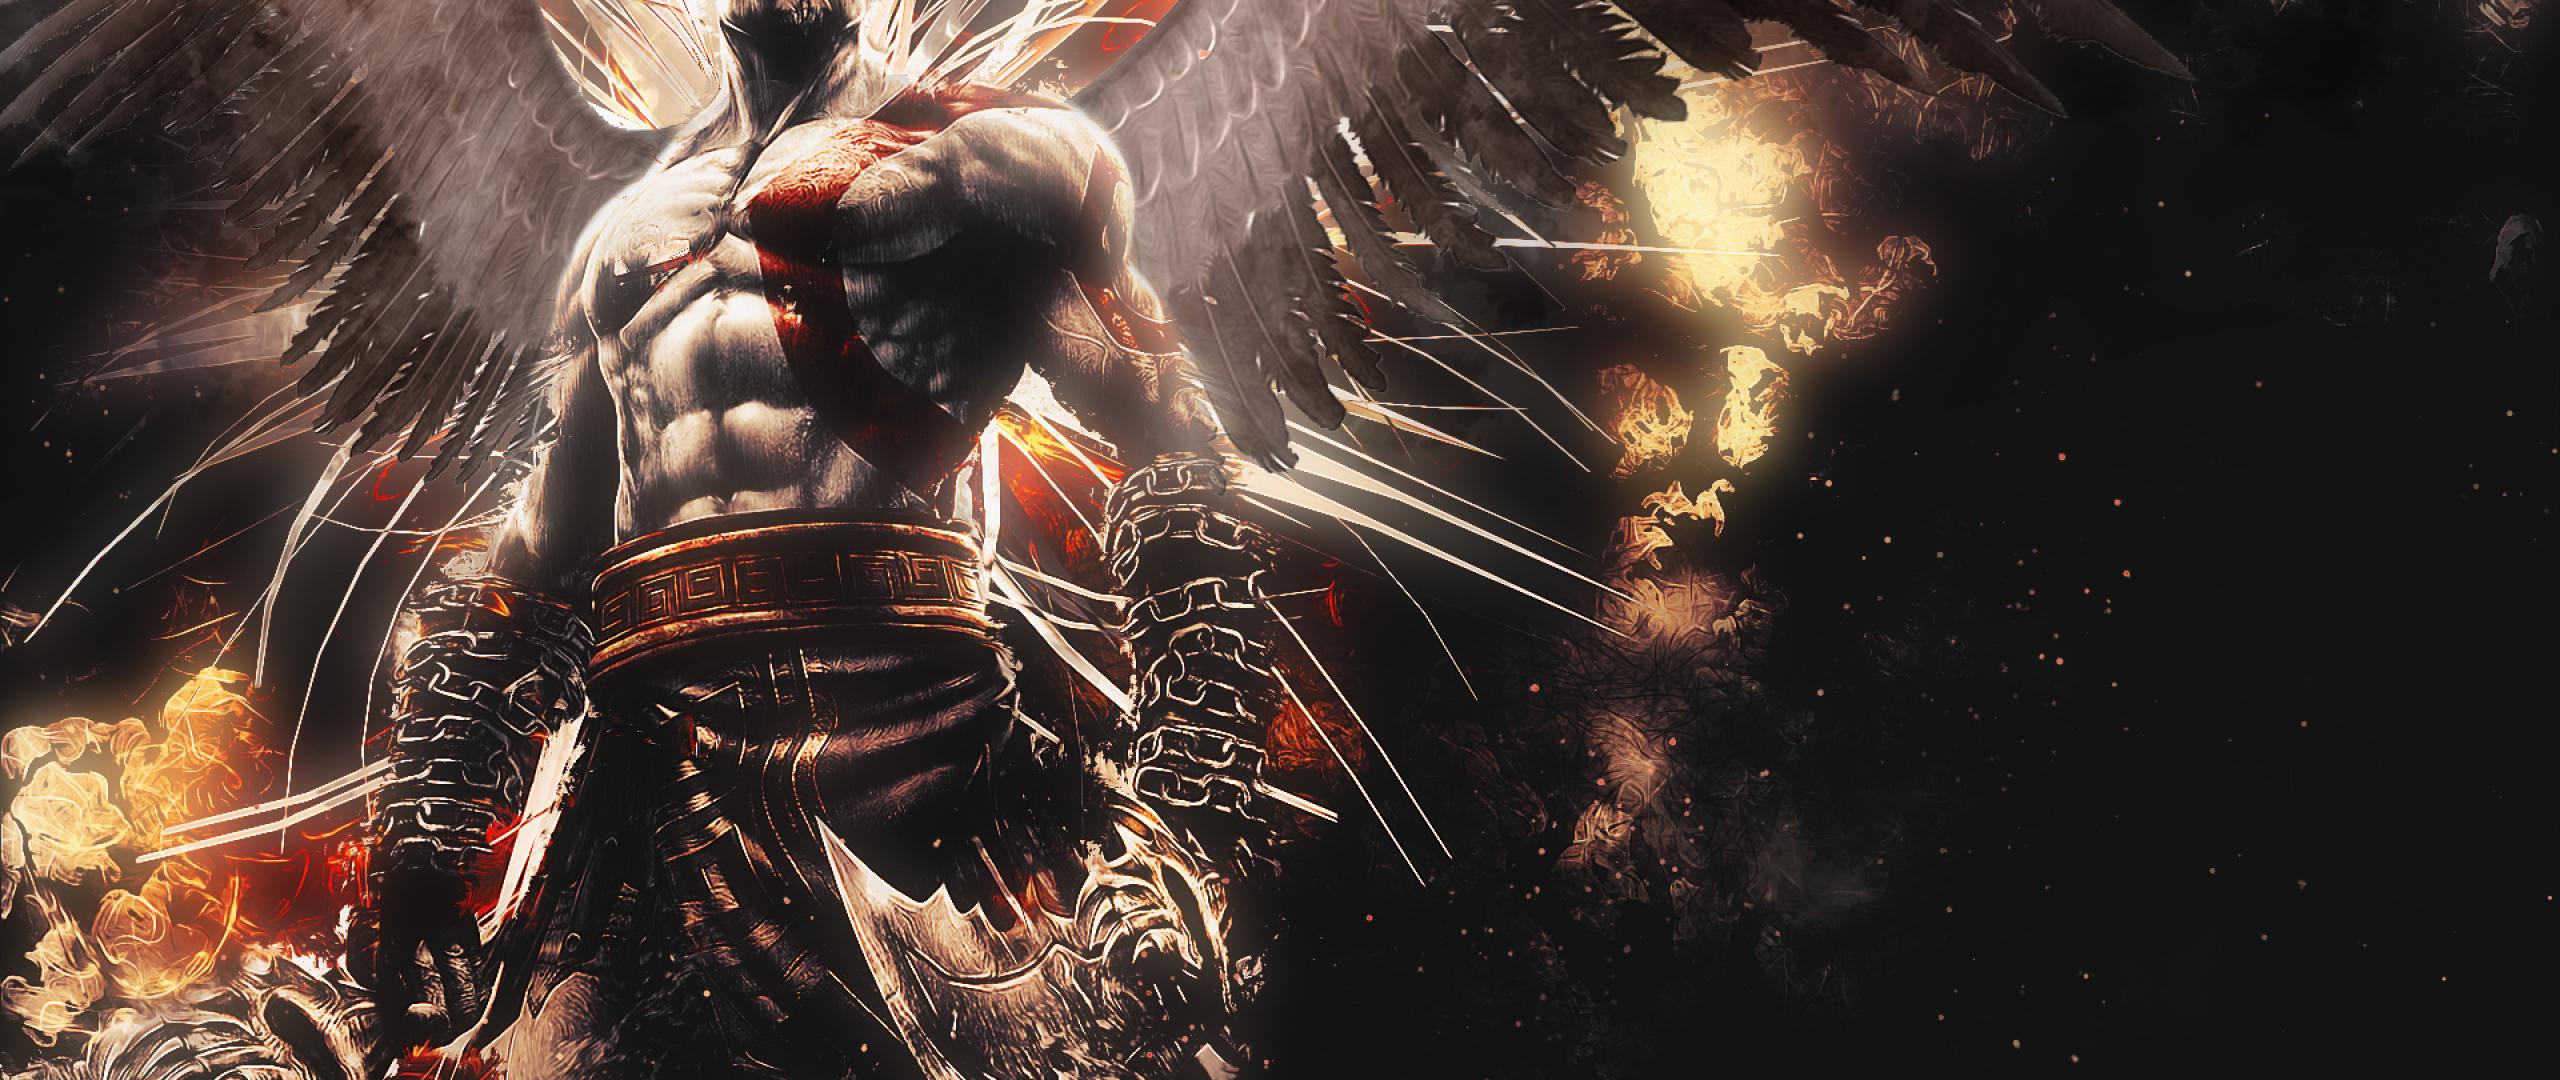 2560x1080 God Of War Ascension Kratos 2560x1080 Resolution